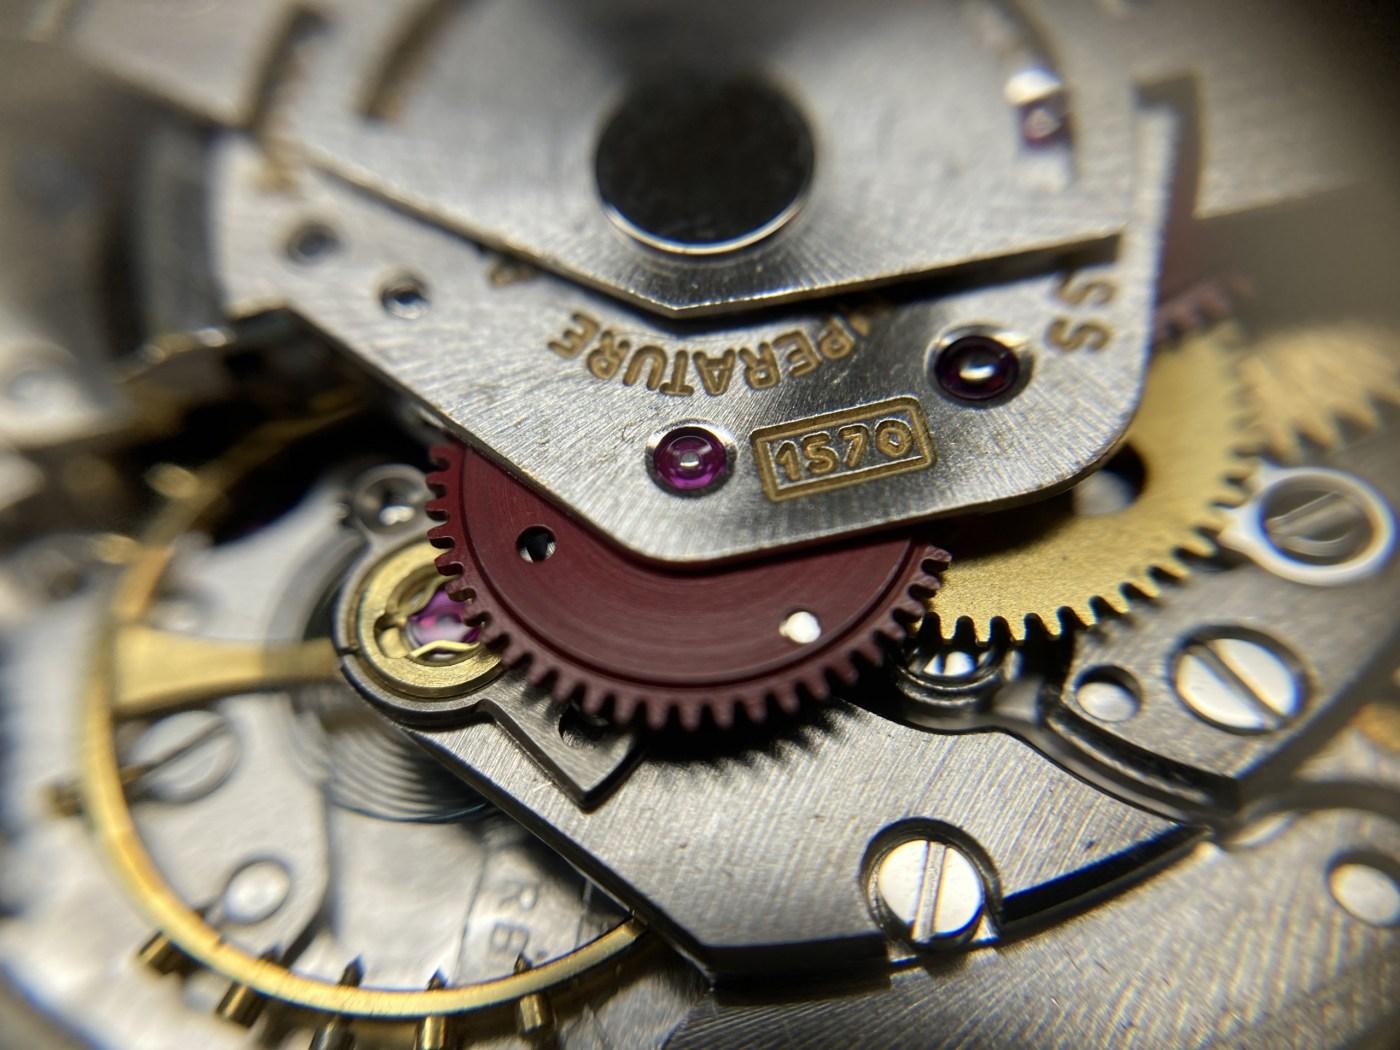 Rolex caliber 1575